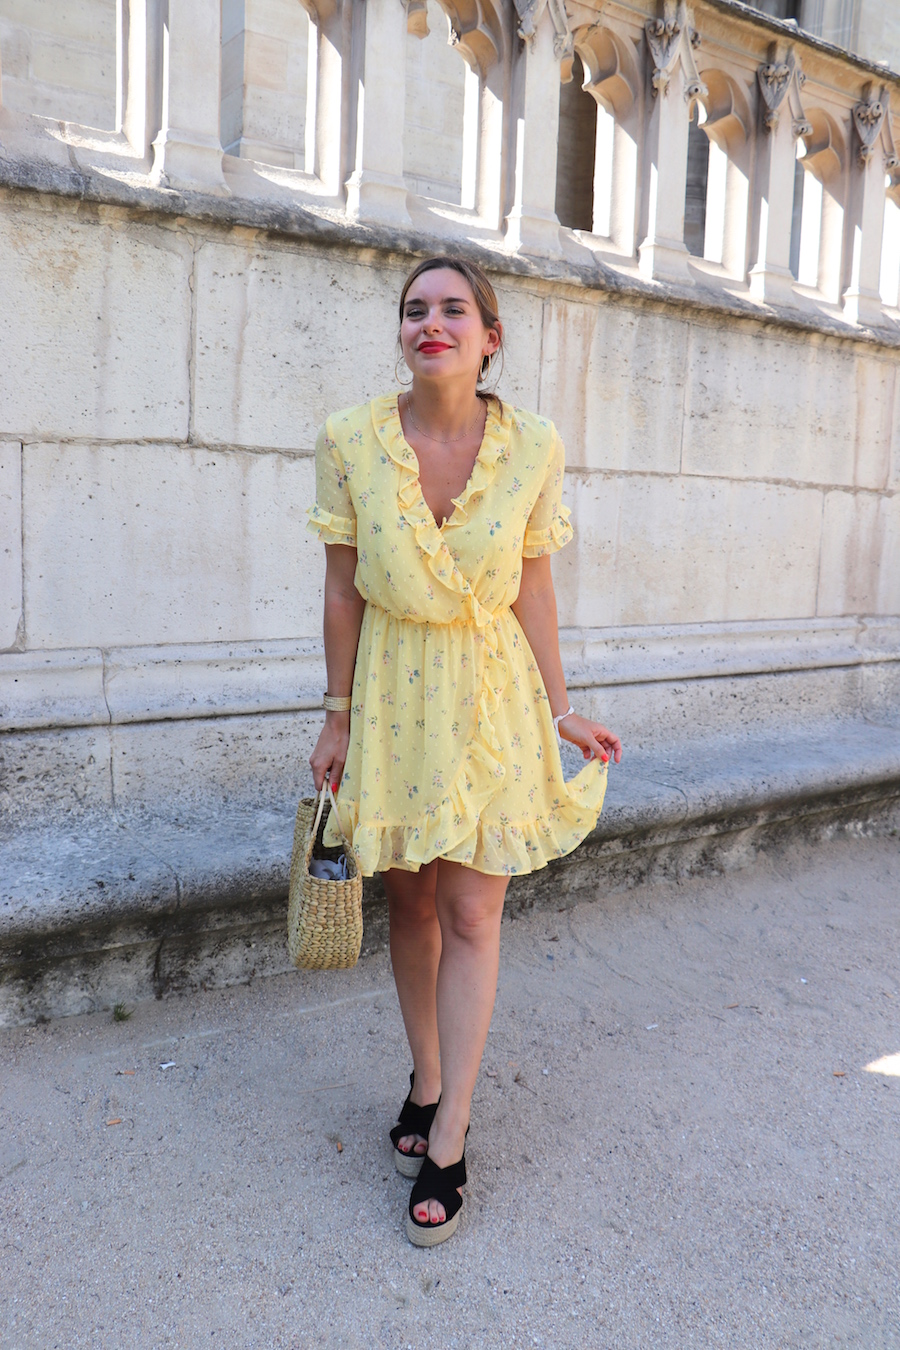 robe jaune fleurie h&m 9